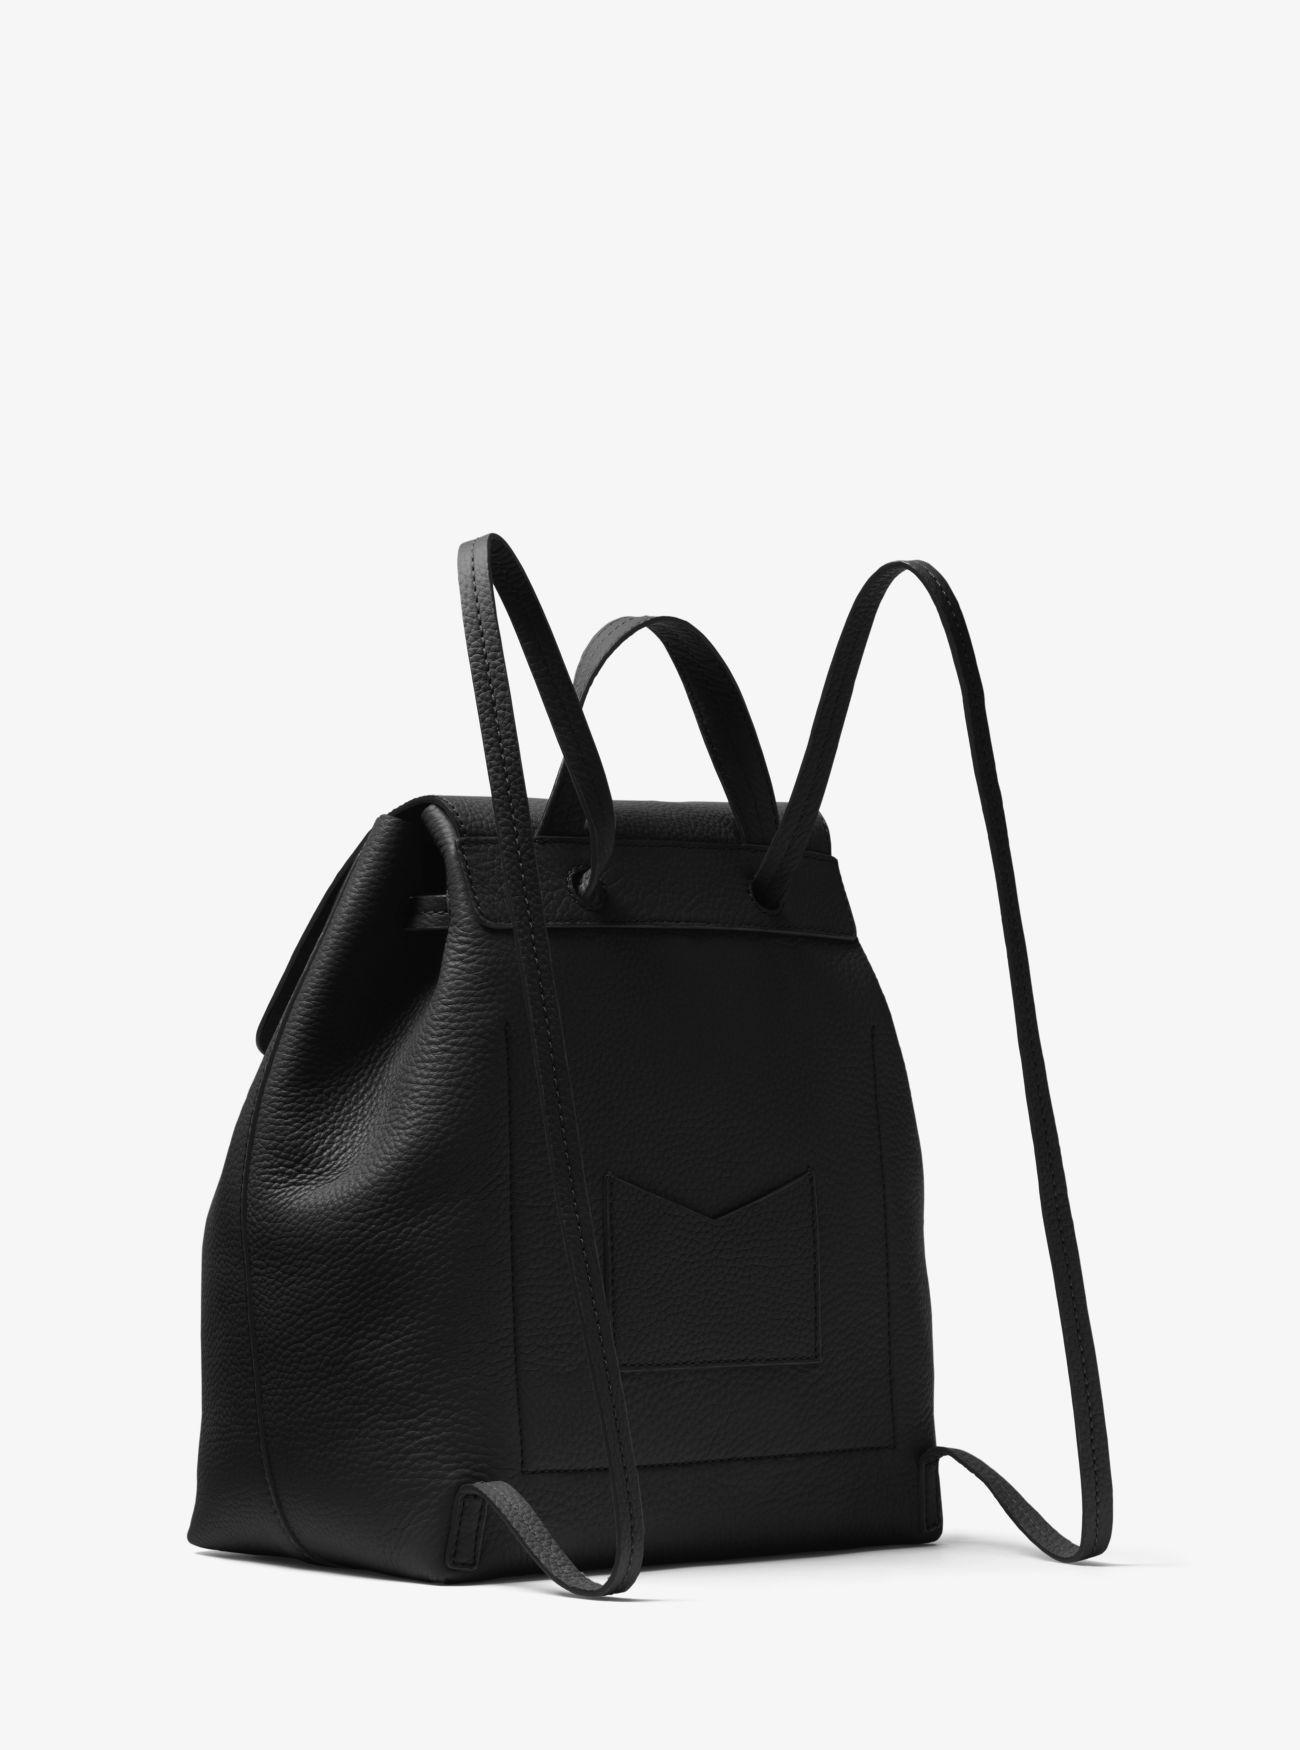 a74be6dcfed5 Michael Kors - Black Junie Medium Pebbled Leather Backpack - Lyst. View  fullscreen